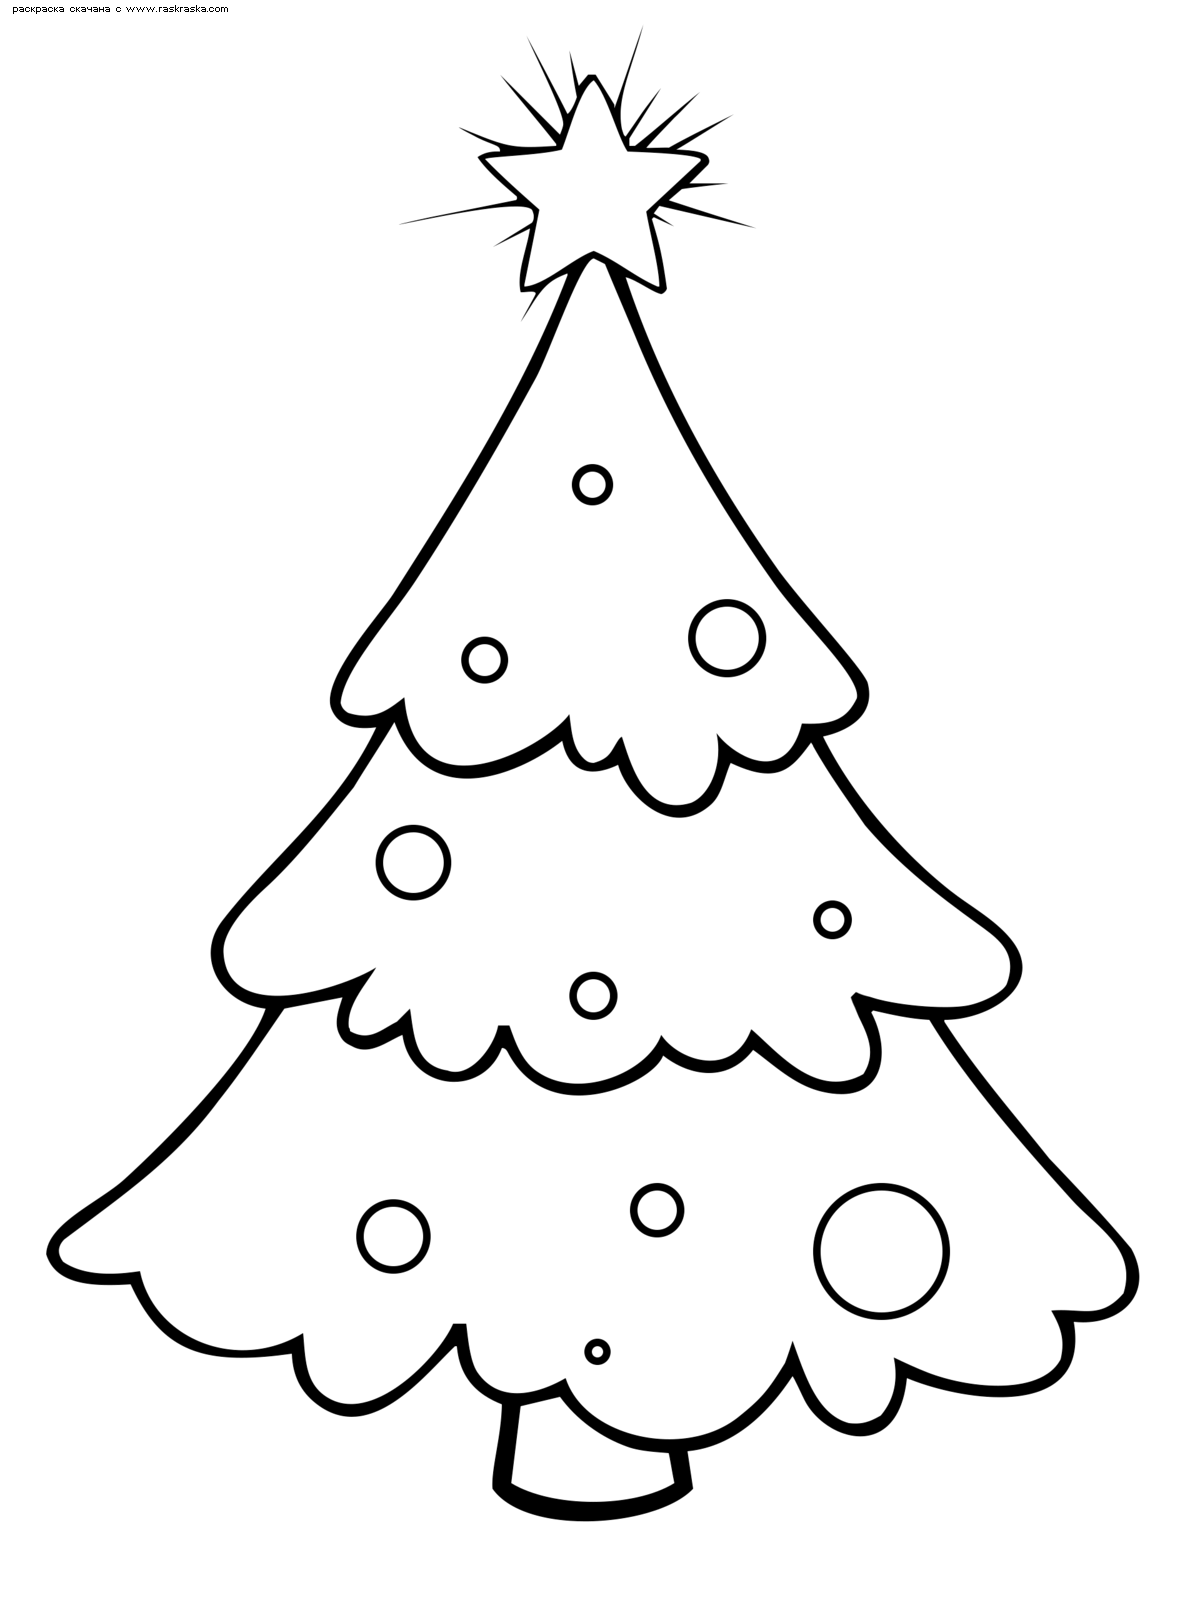 Раскраска Нарядная новогодняя елка. Раскраска елка